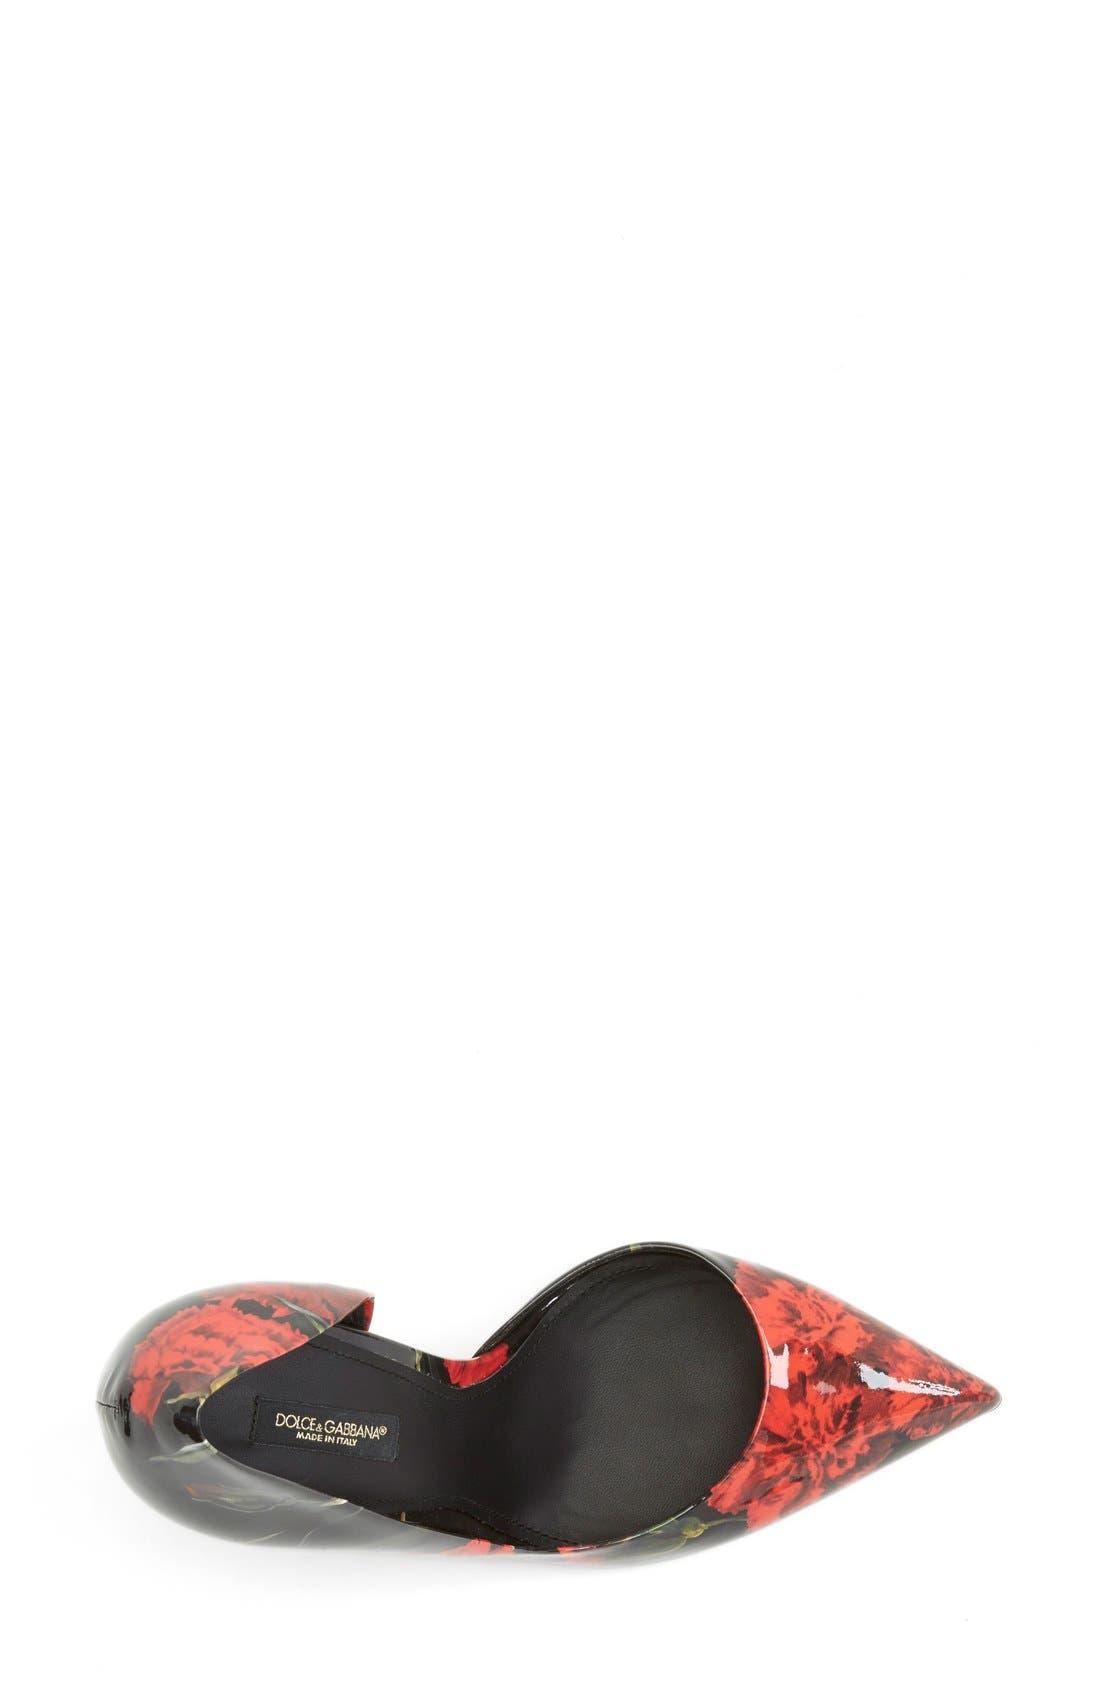 Alternate Image 3  - Dolce&Gabbana Floral Print Patent Leather Half d'Orsay Pump (Women)